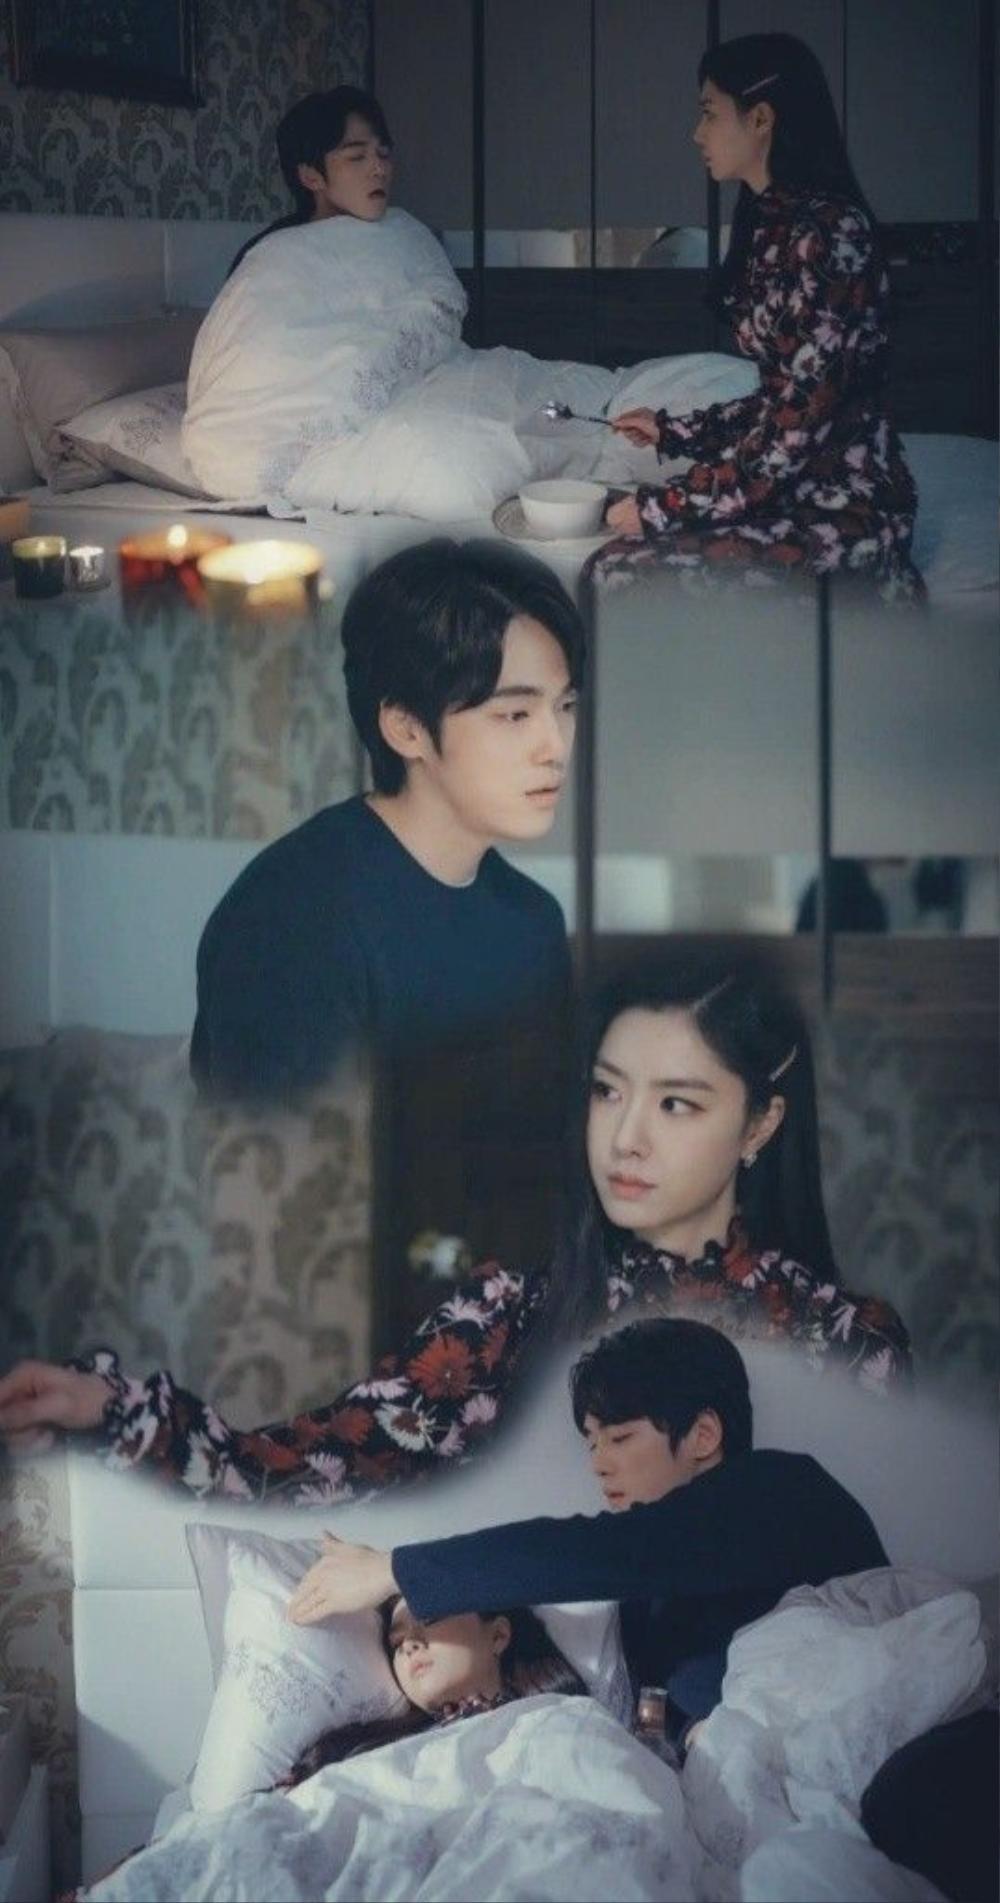 Seo Ji Hye - Kim Jung Hyun phủ nhận hẹn hò! Ảnh 3